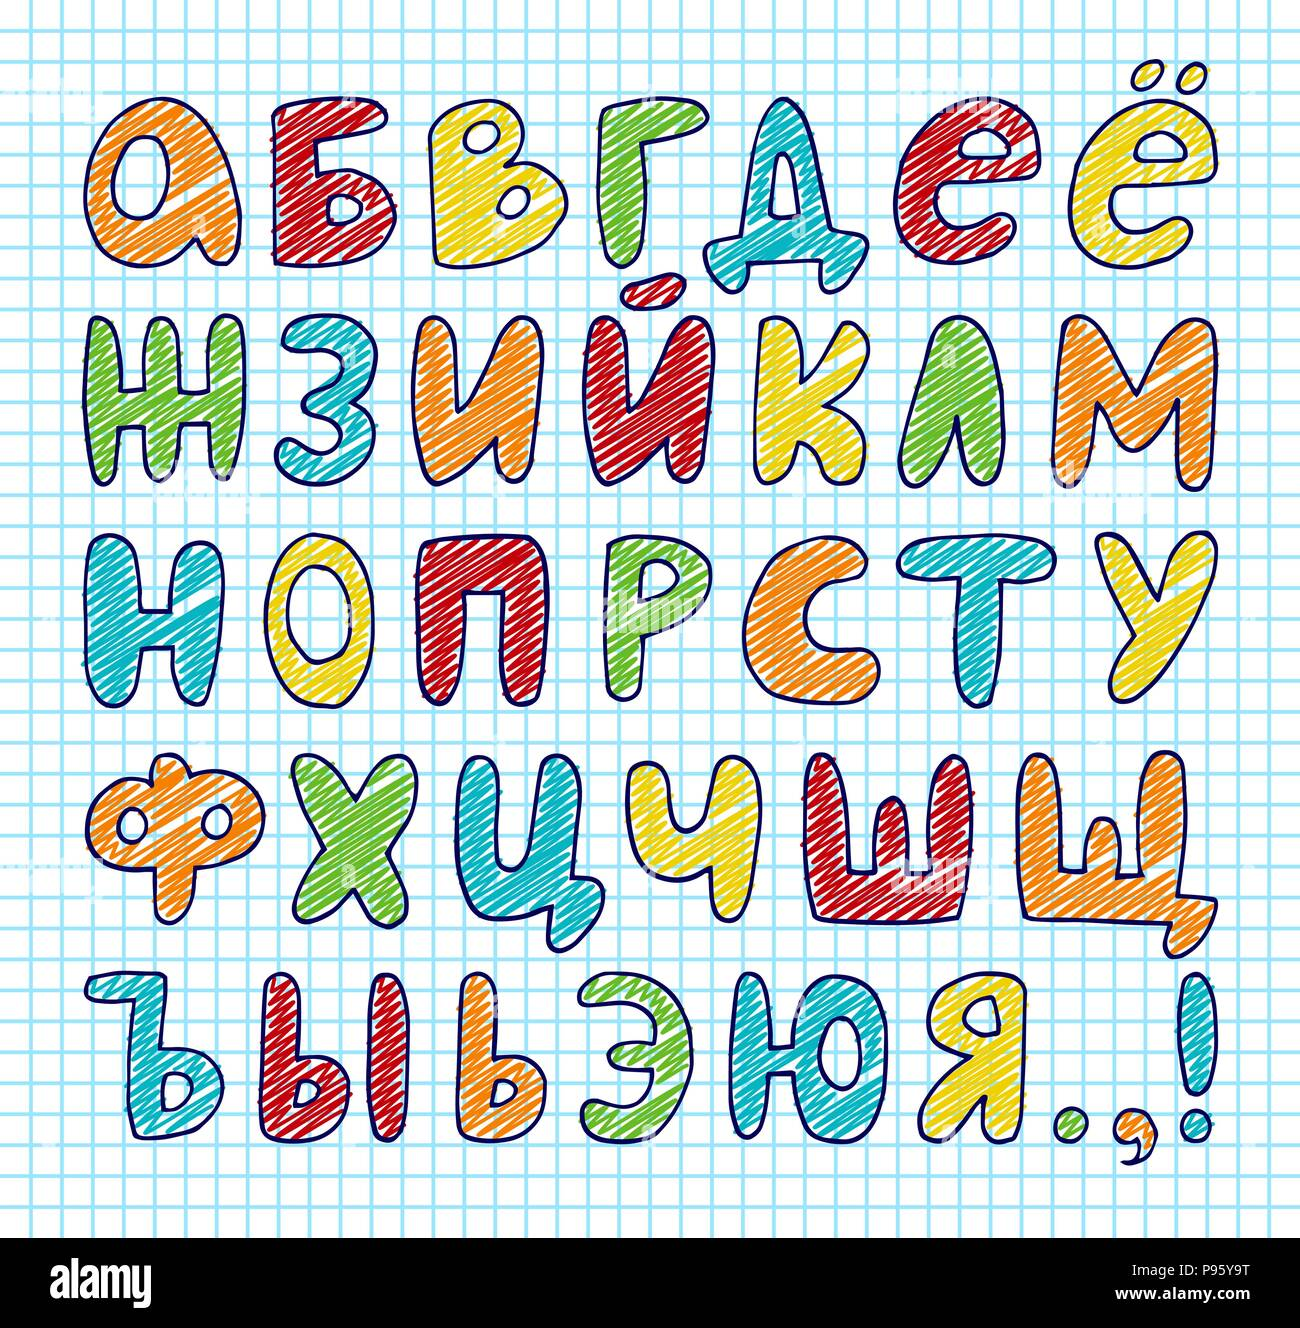 Russian Alphabet Stock Photos Amp Russian Alphabet Stock Images